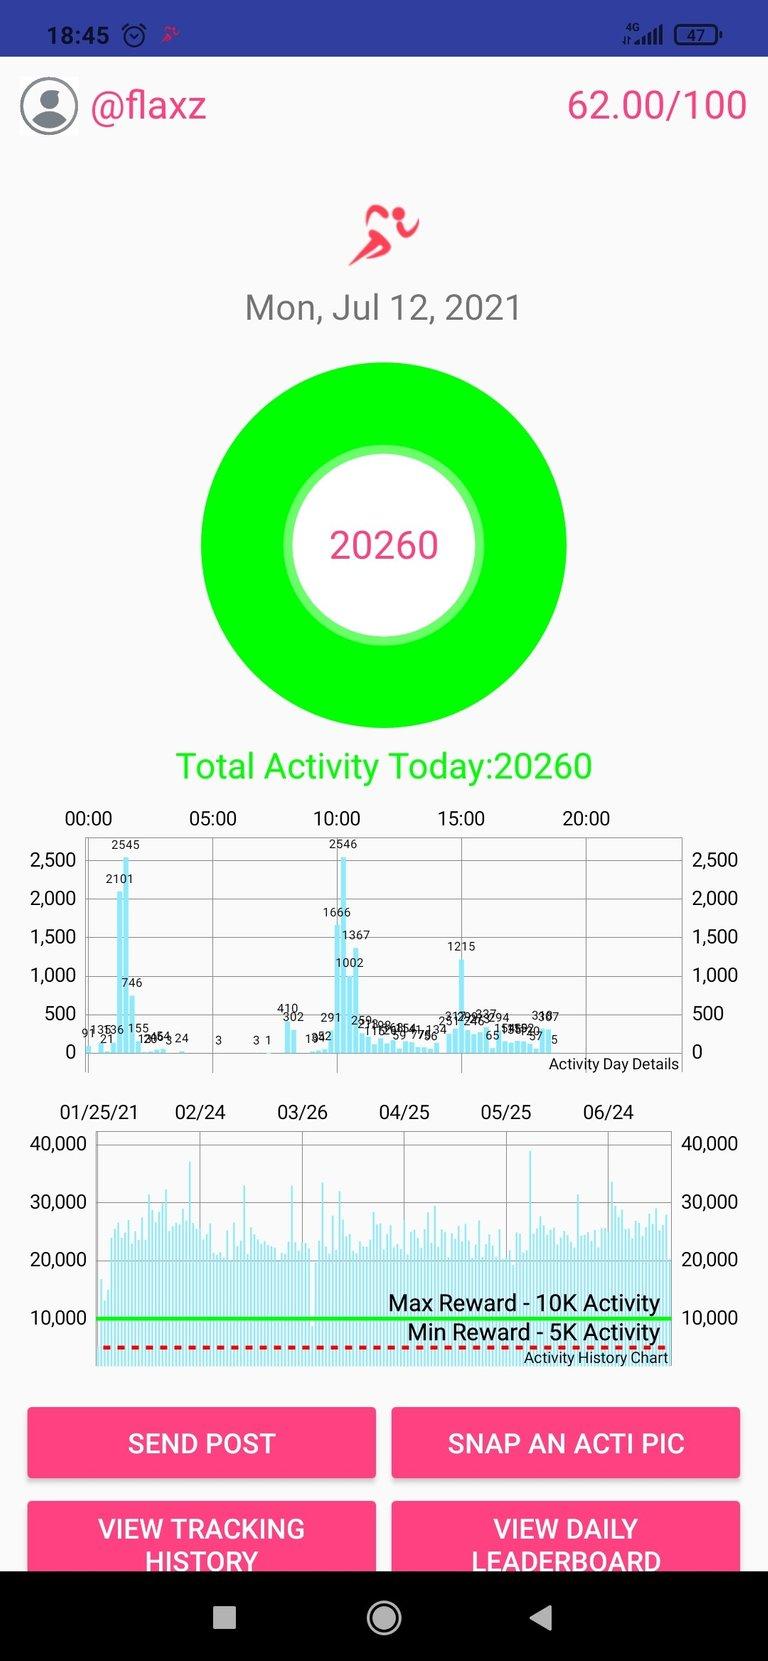 Screenshot_2021-07-12-18-45-18-880_io.actifit.fitnesstracker.actifitfitnesstracker.jpg